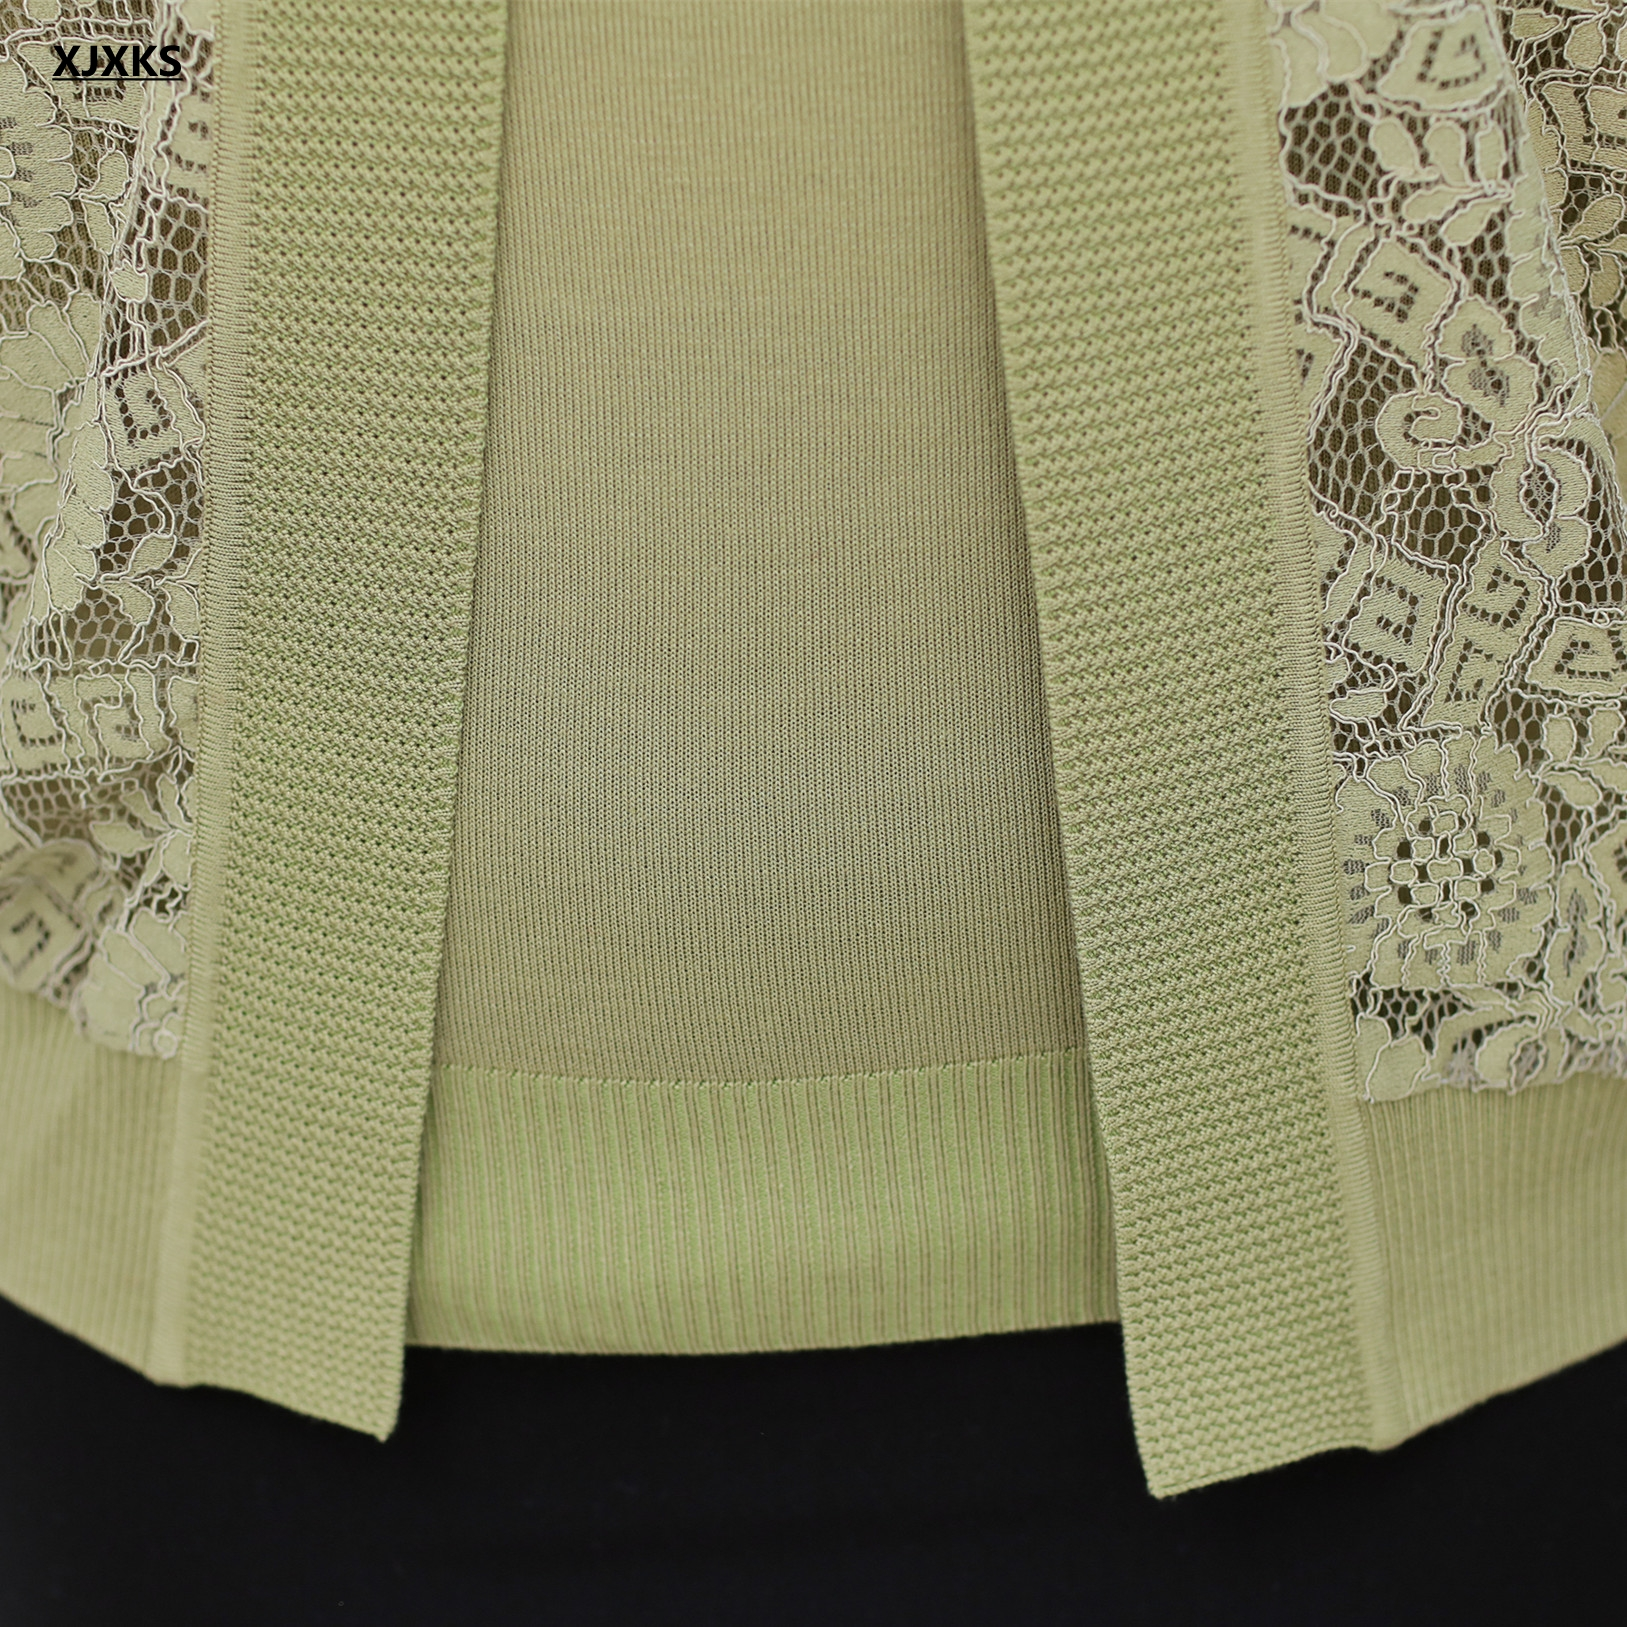 Moda Tricot Jumper Suéter Suéteres Mujeres Elegante Xjxks verde Mujer Otoño Punto Cardigans Colour Caramel Cordón Crocheted Del De rosado 2017 Set q707nS8wE